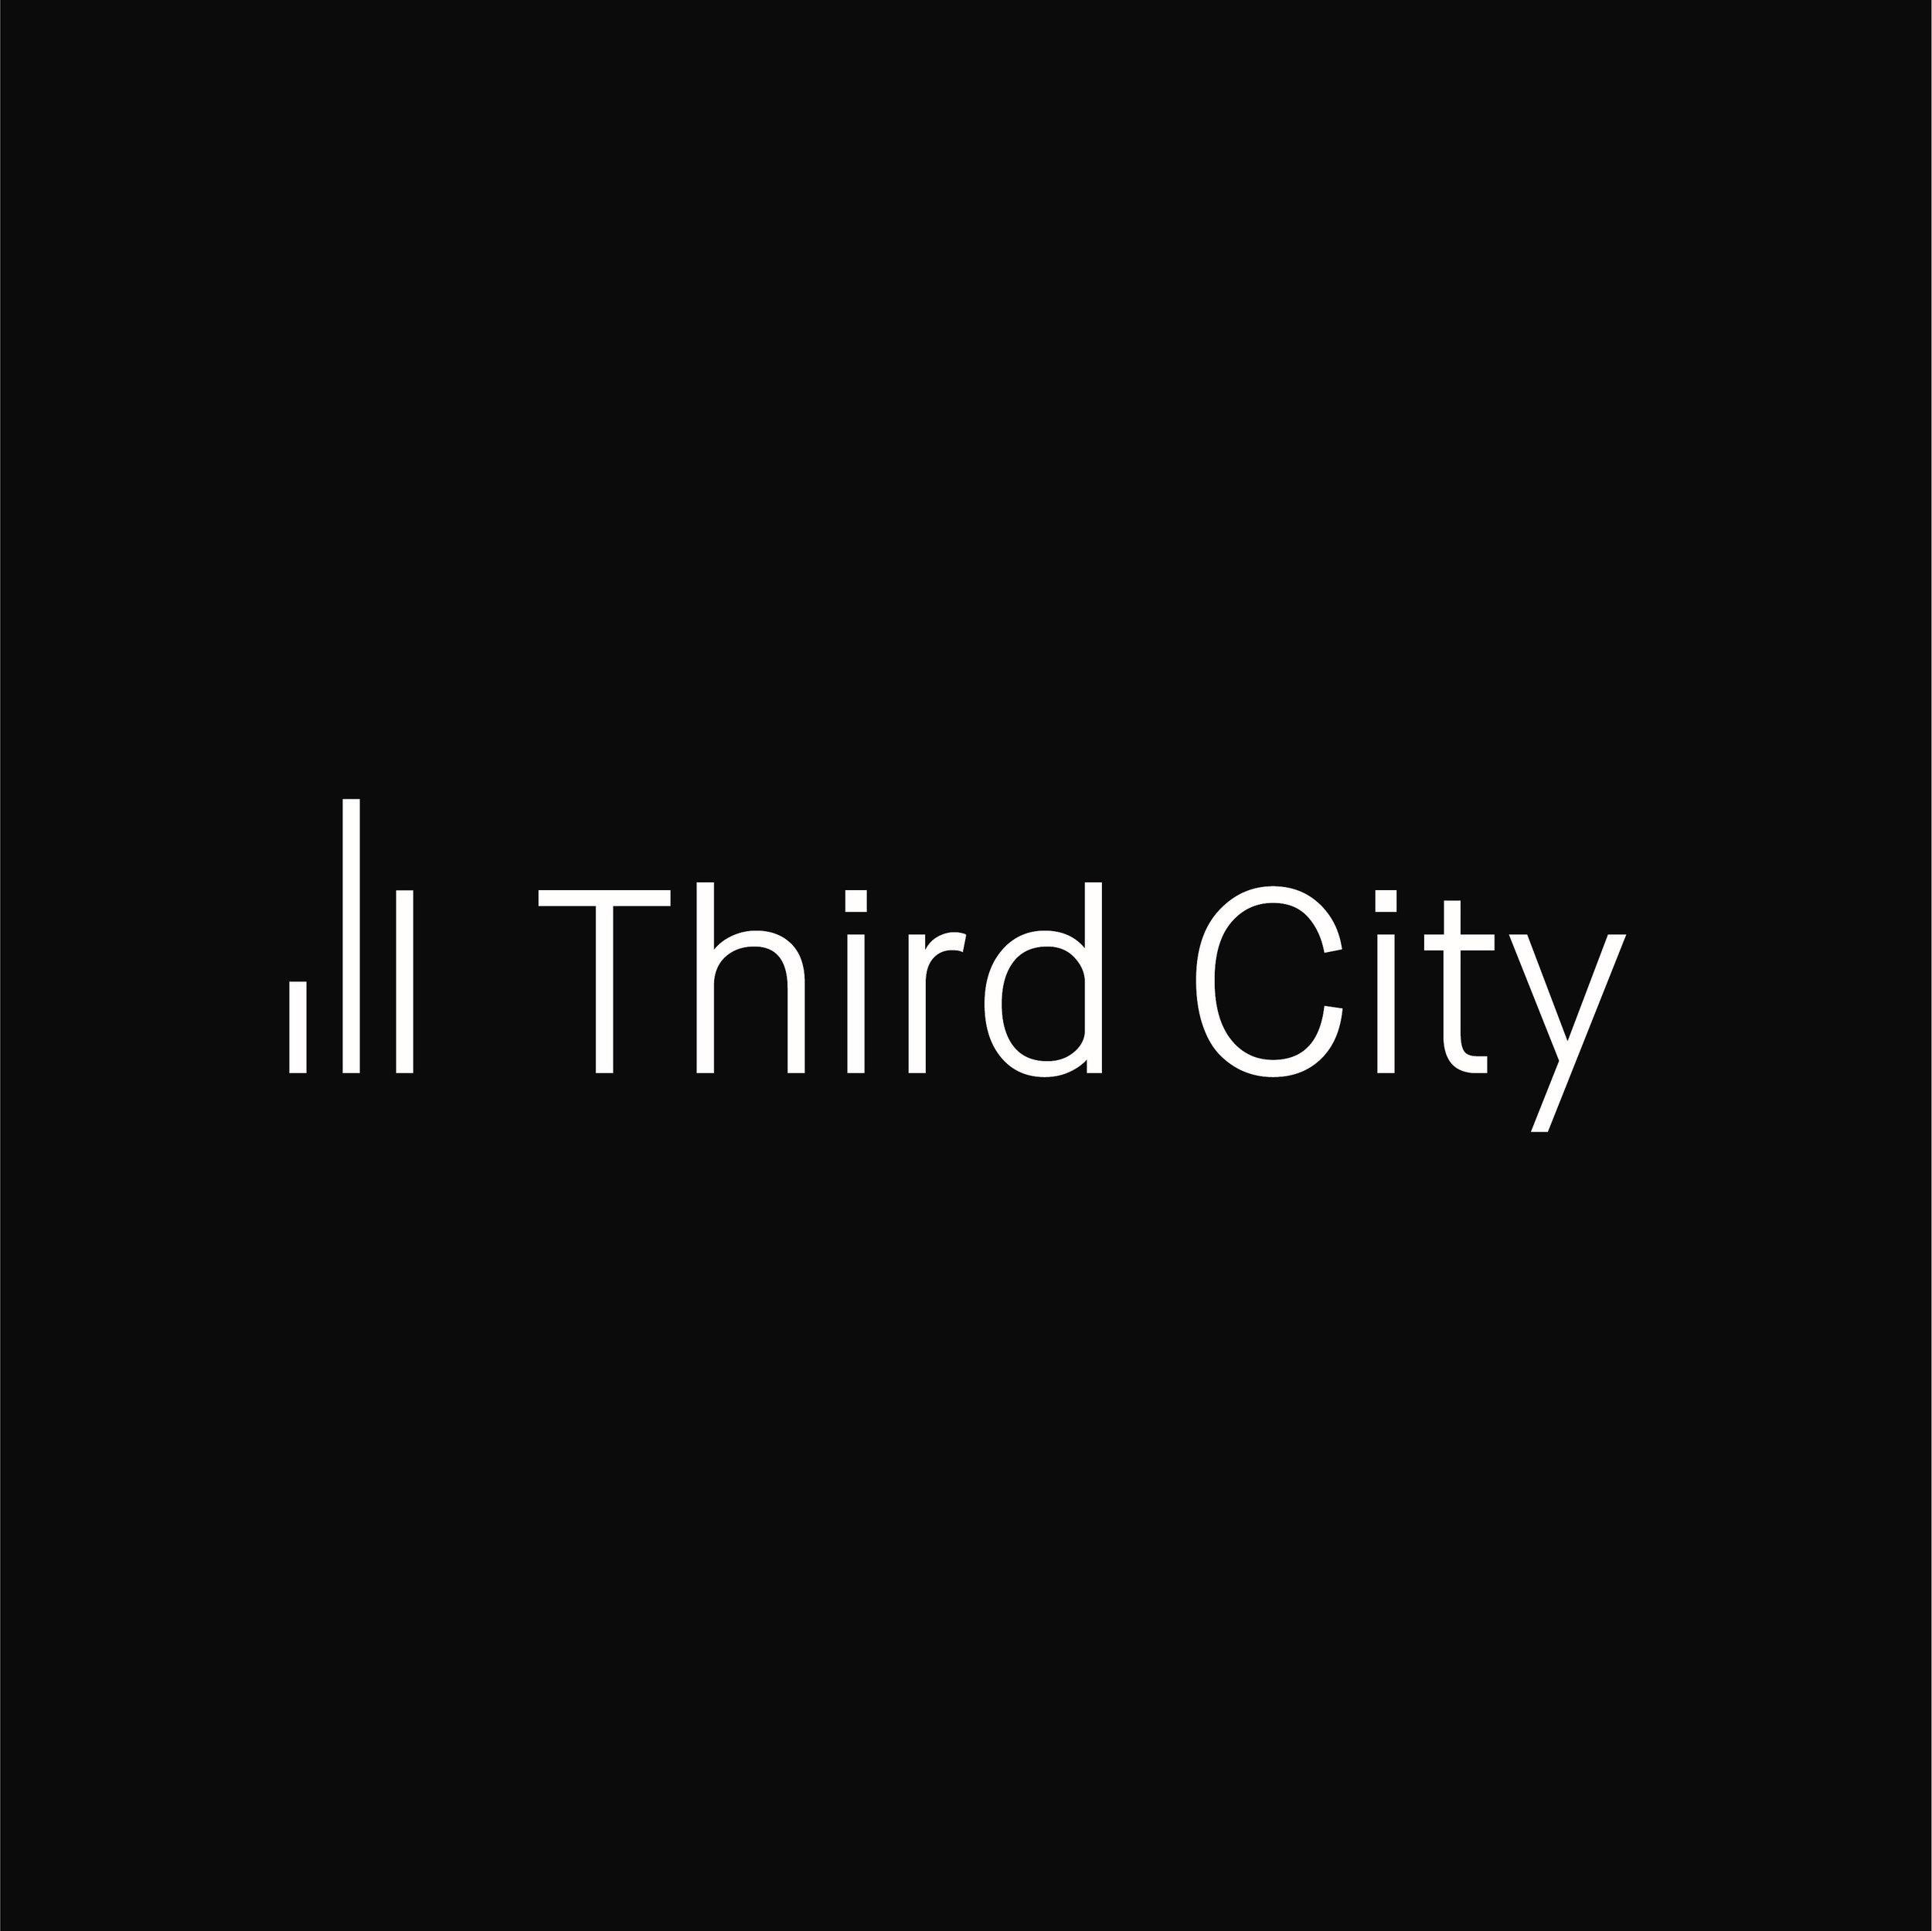 Third City.jpg